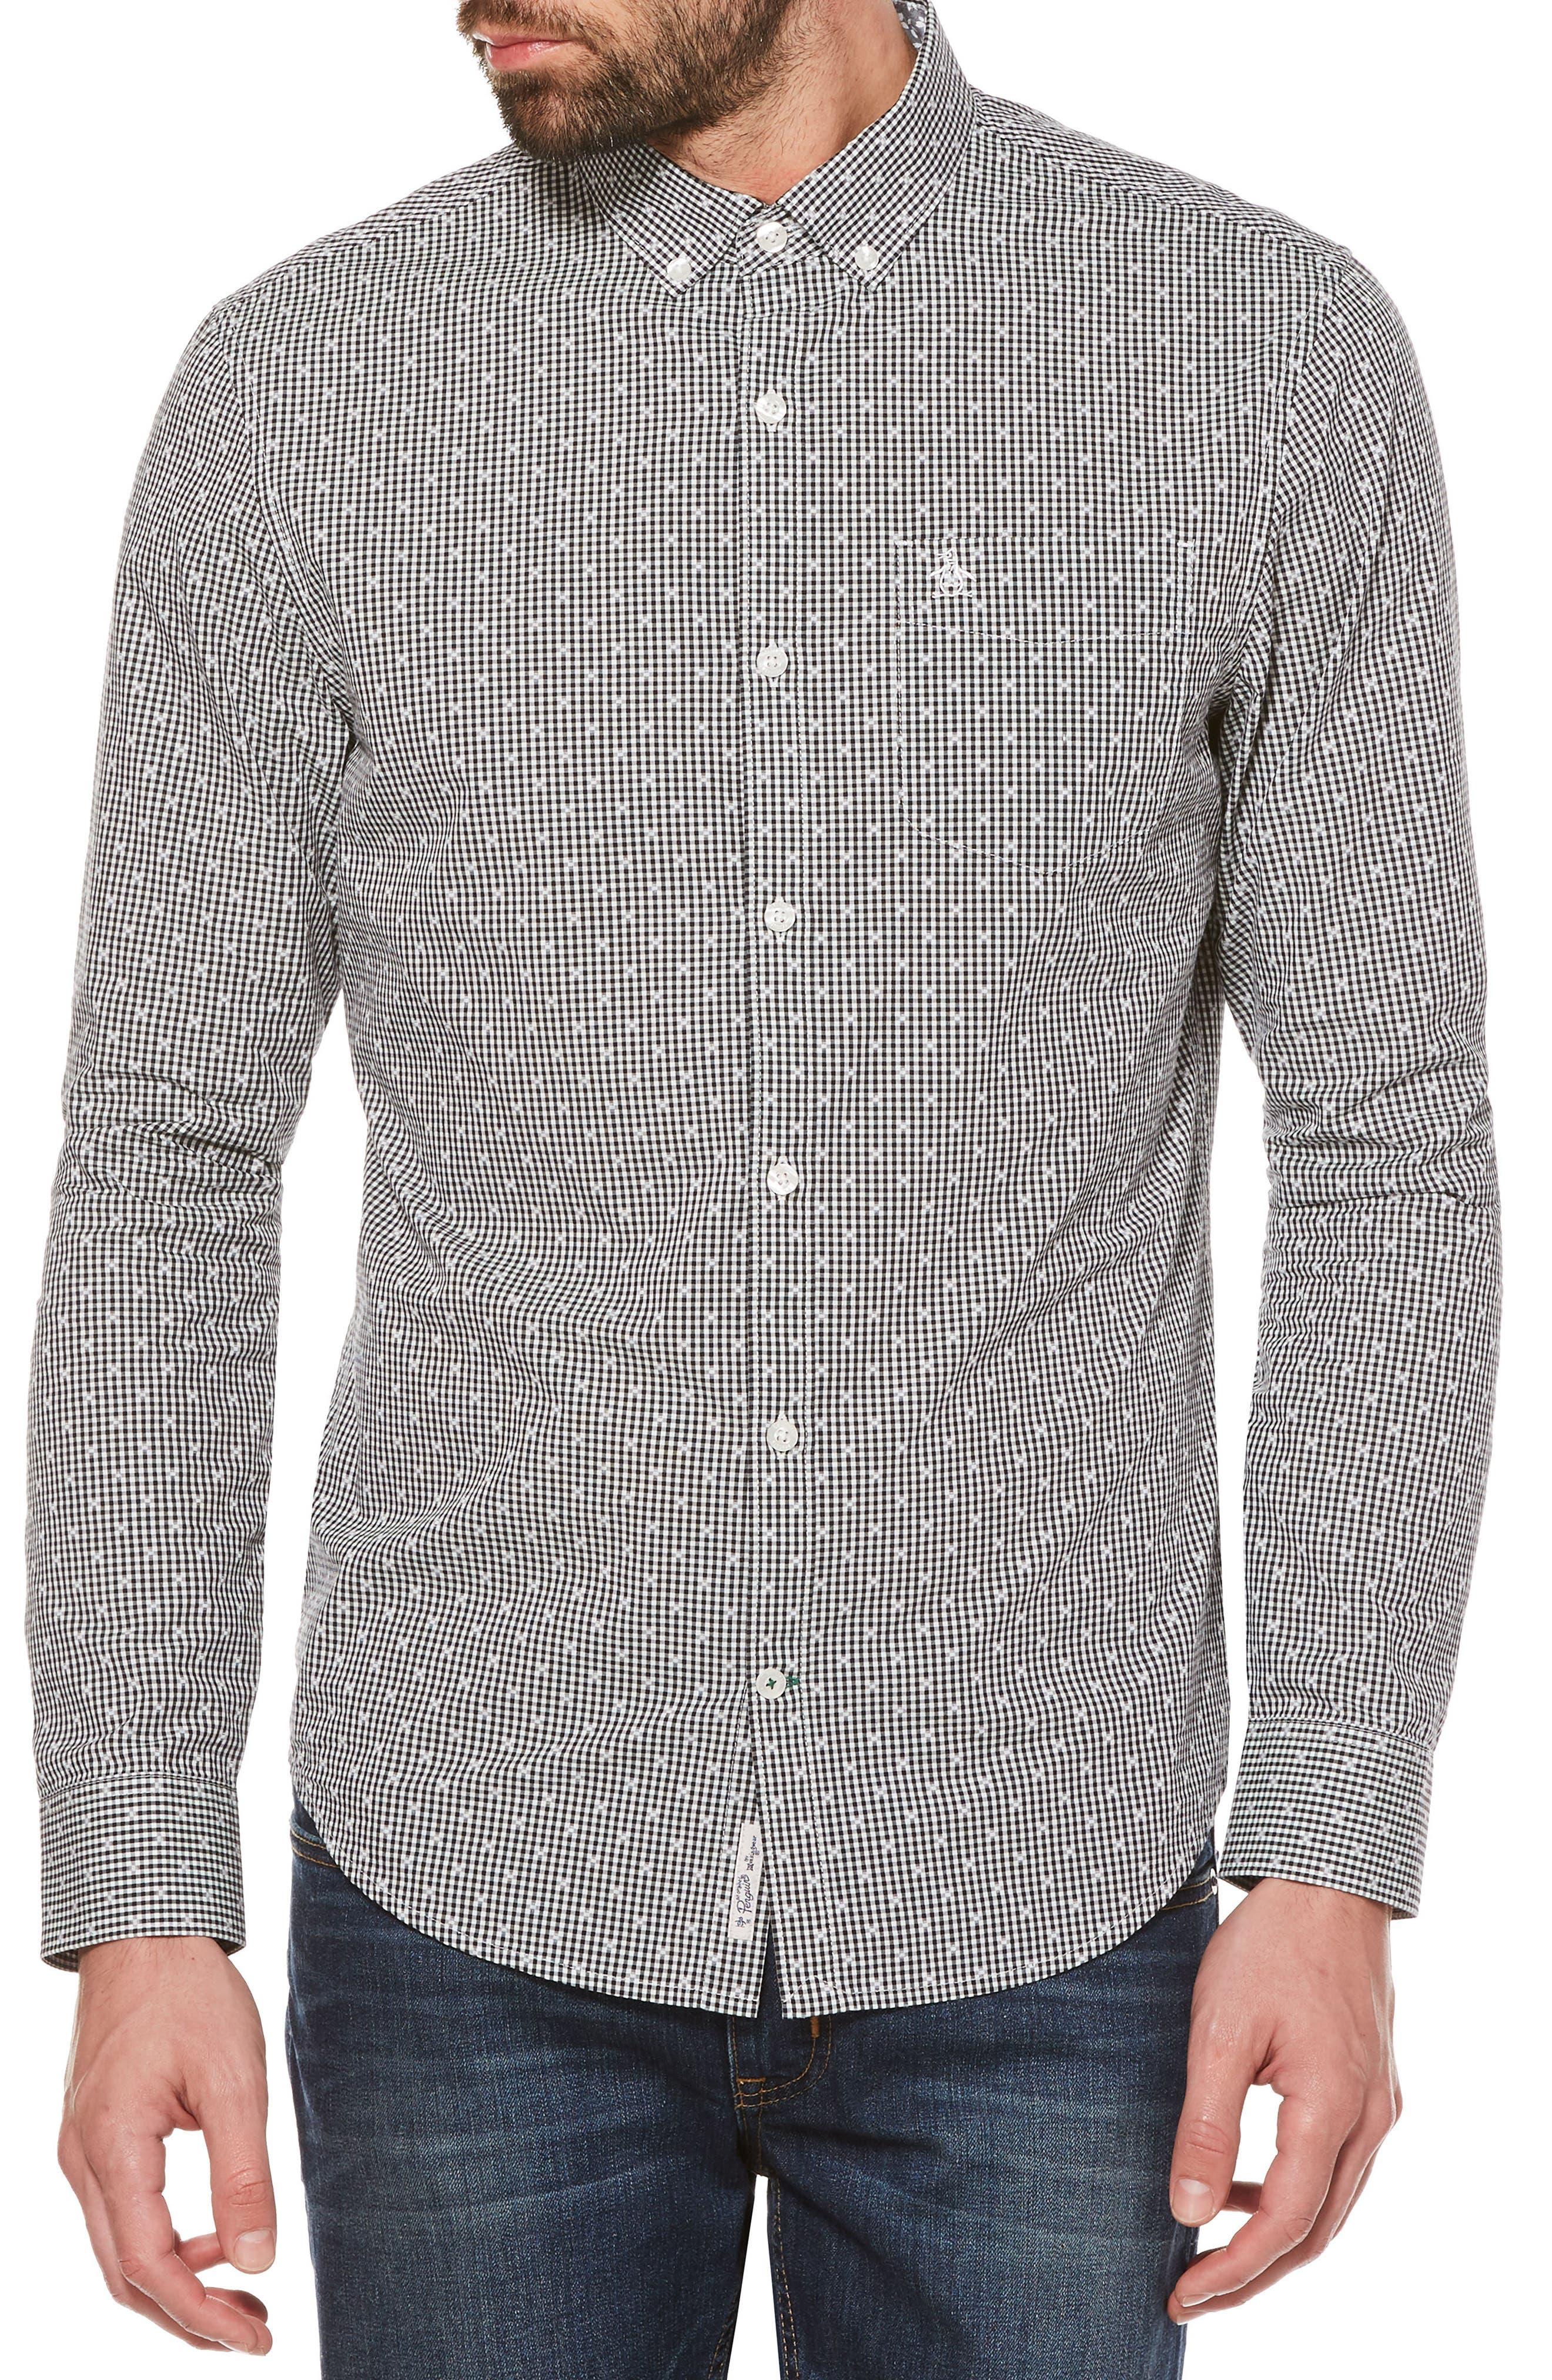 ORIGINAL PENGUIN Dobby Gingham Sport Shirt, Main, color, 010